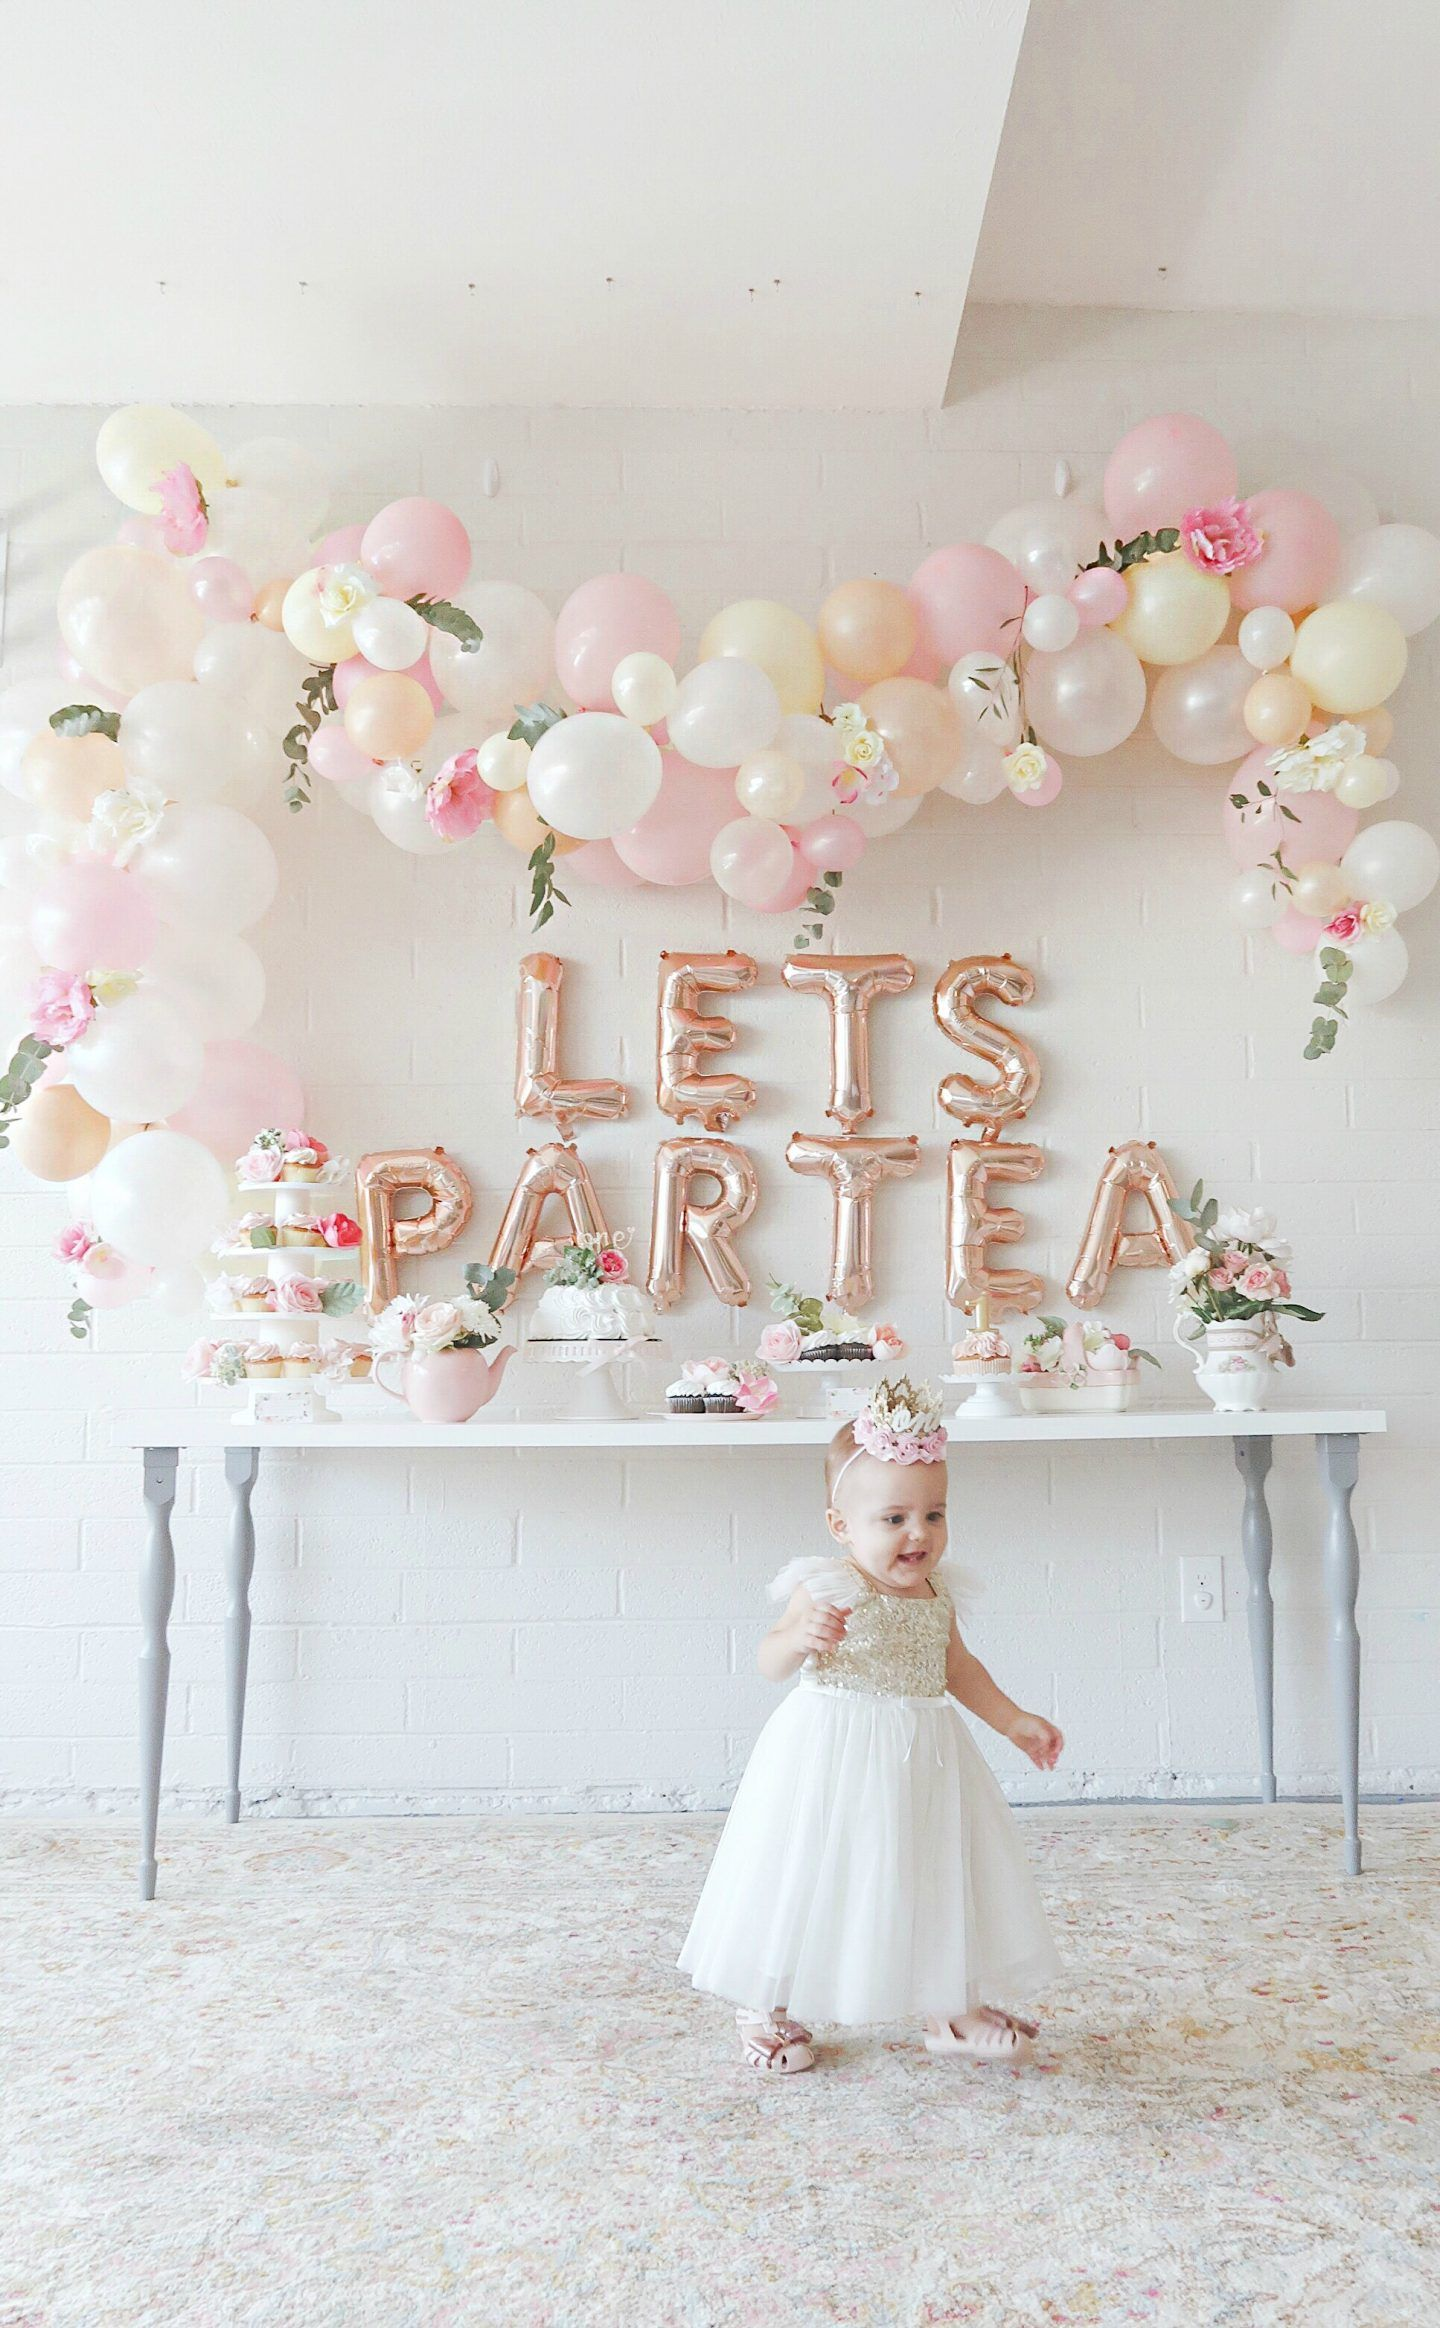 First Birthday Tea Party Lets Partea Birthday Decor Pink Party Decorations Tea Party Birthday Birthday Decorations